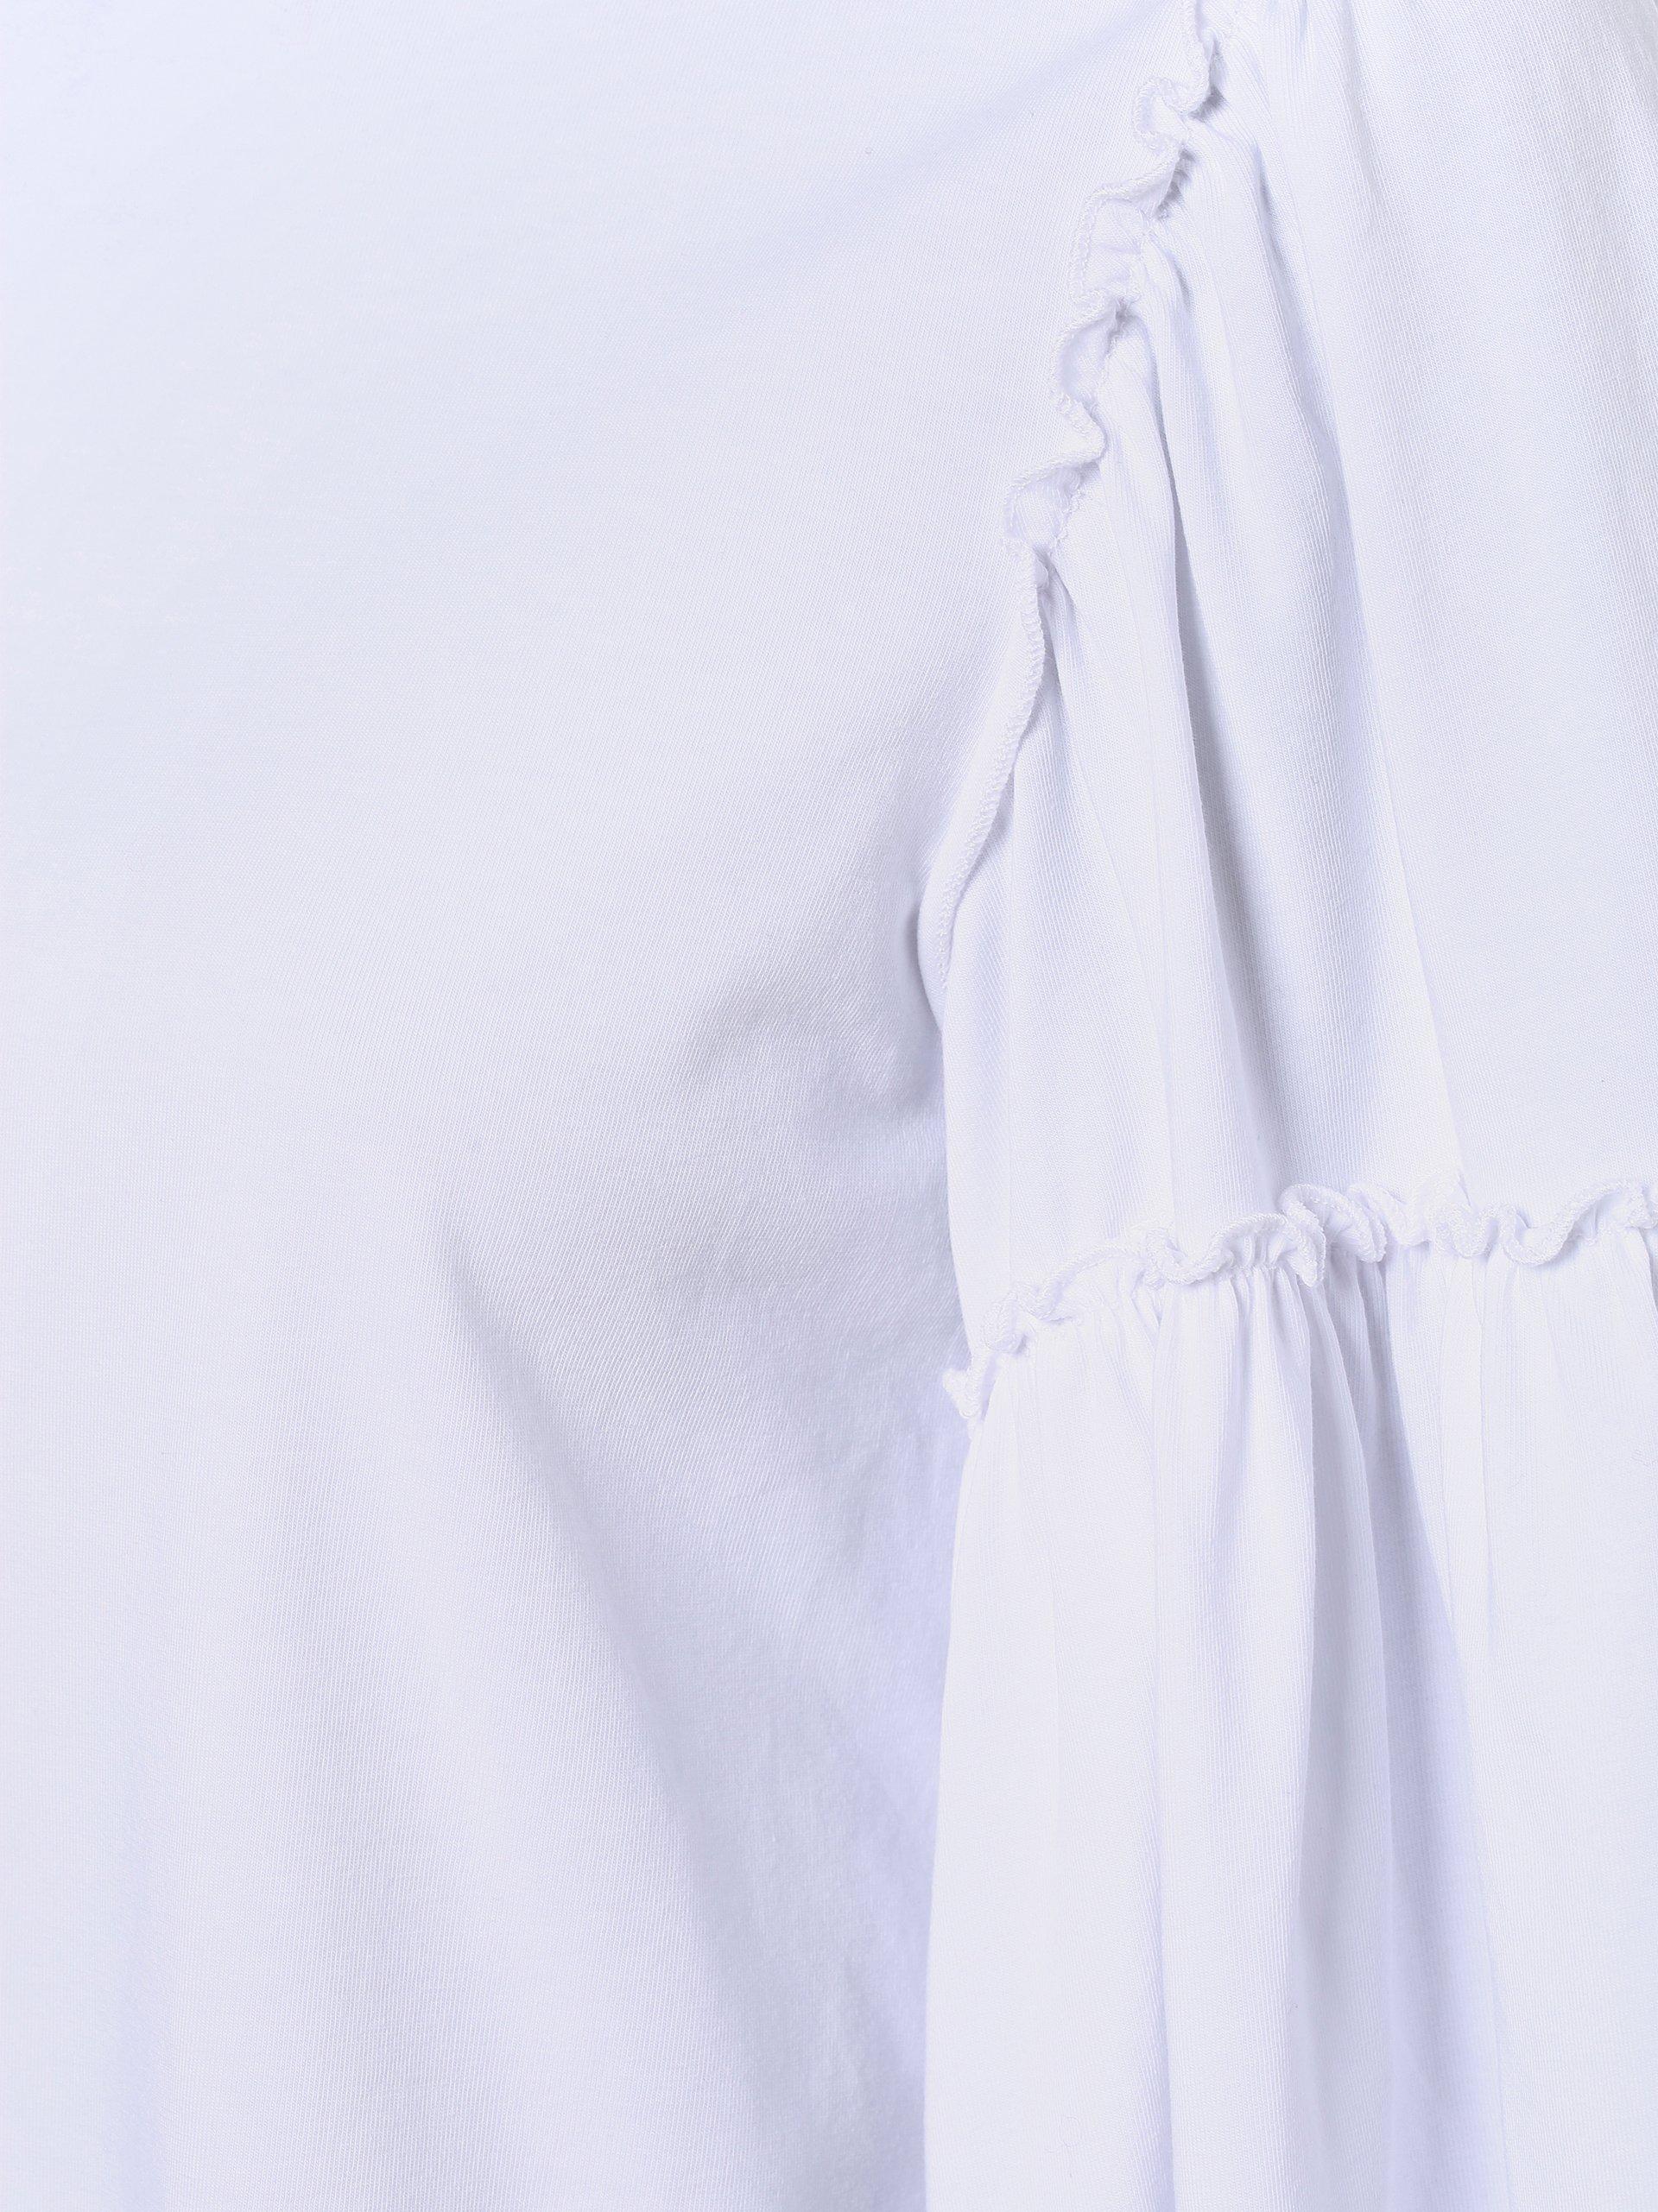 the mercer n y damen shirt wei uni online kaufen vangraaf com. Black Bedroom Furniture Sets. Home Design Ideas